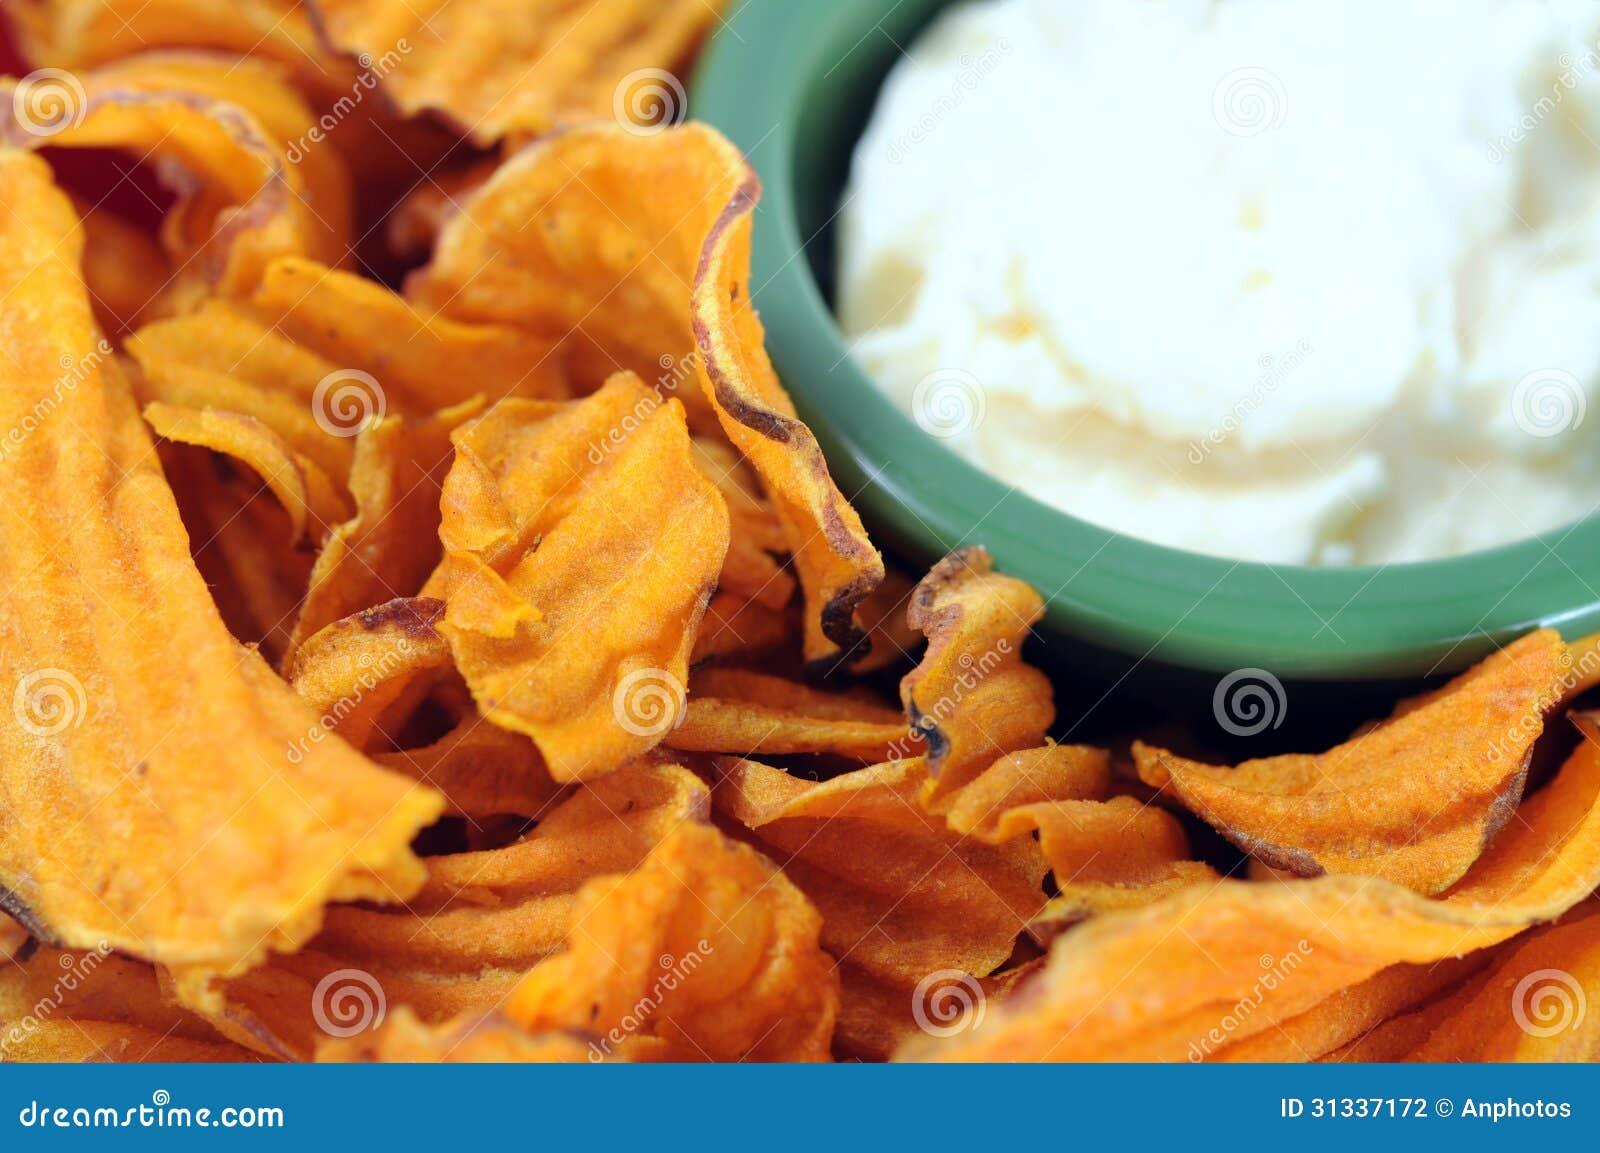 Potato Chip And Onion Dip Burgers Recipes — Dishmaps